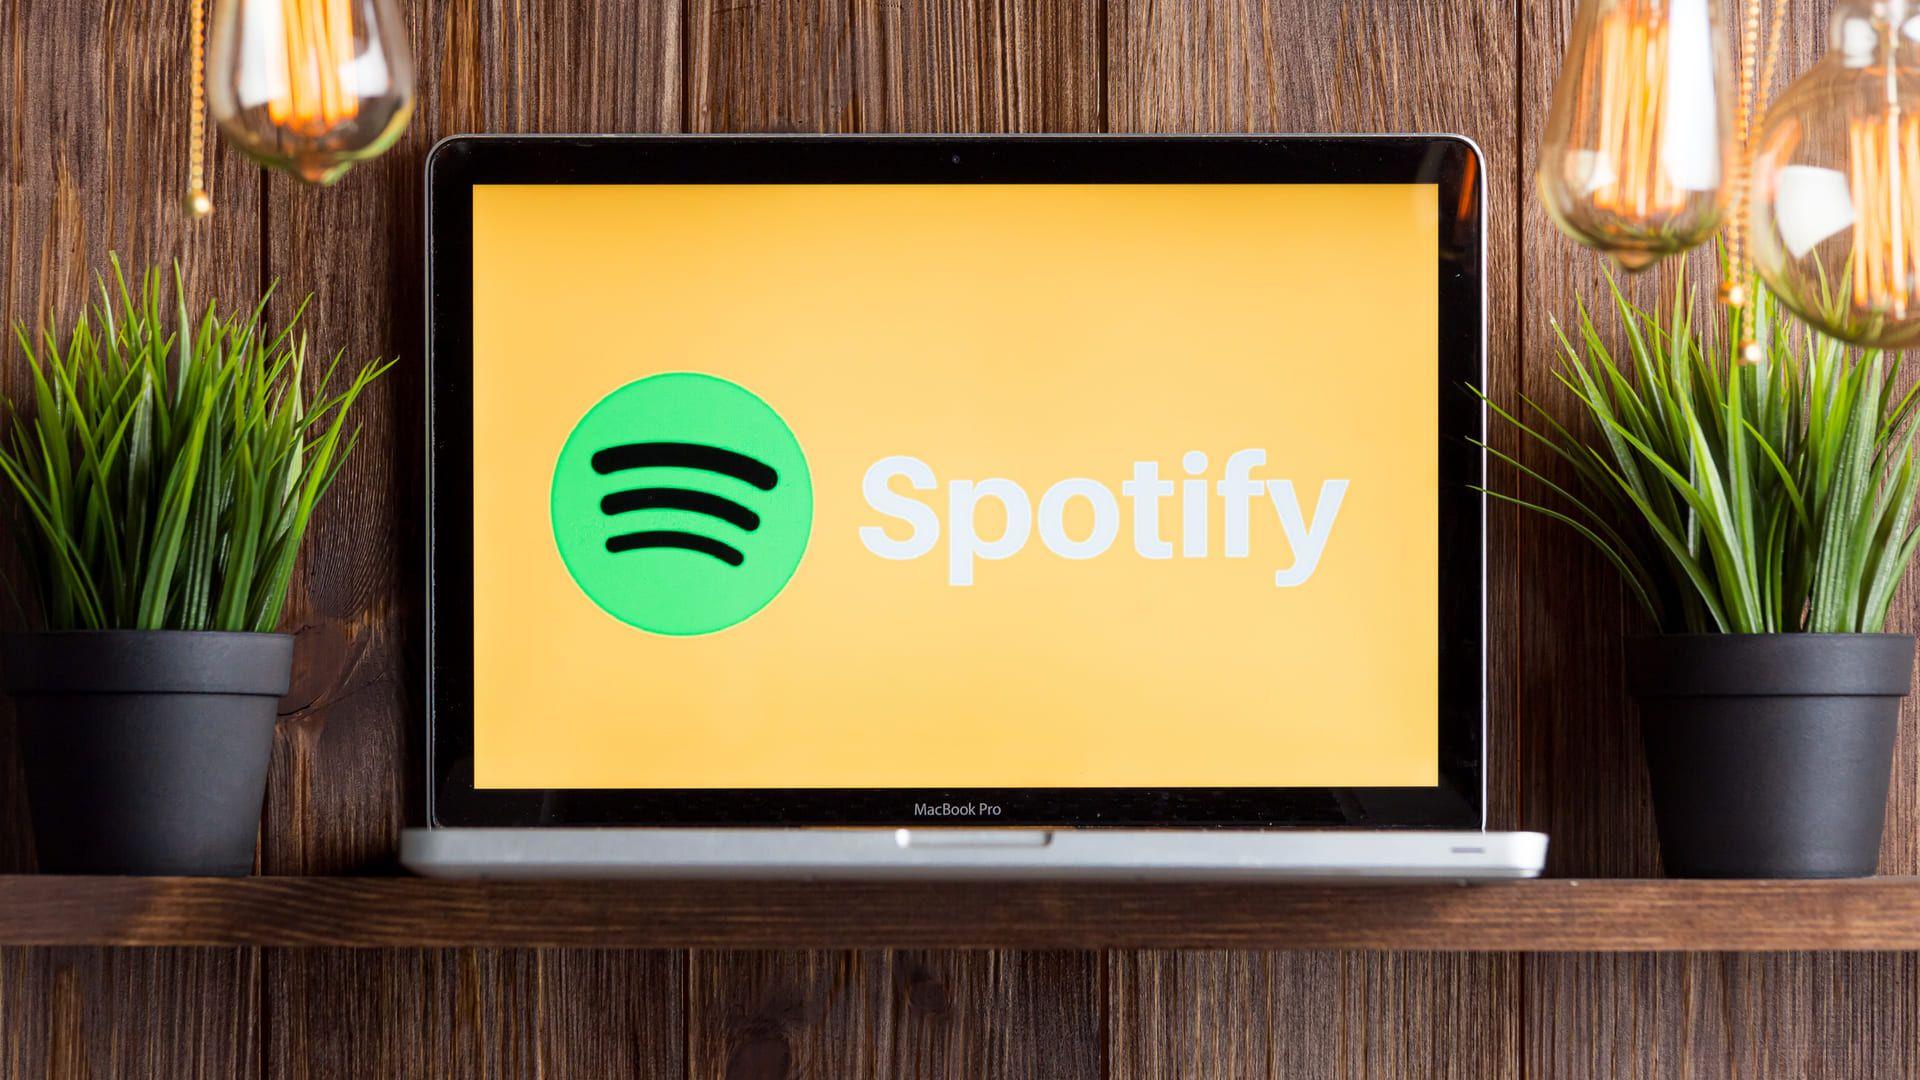 Baixar Spotify para PC é muito simples (Foto: Burdun Iliya / Shutterstock)